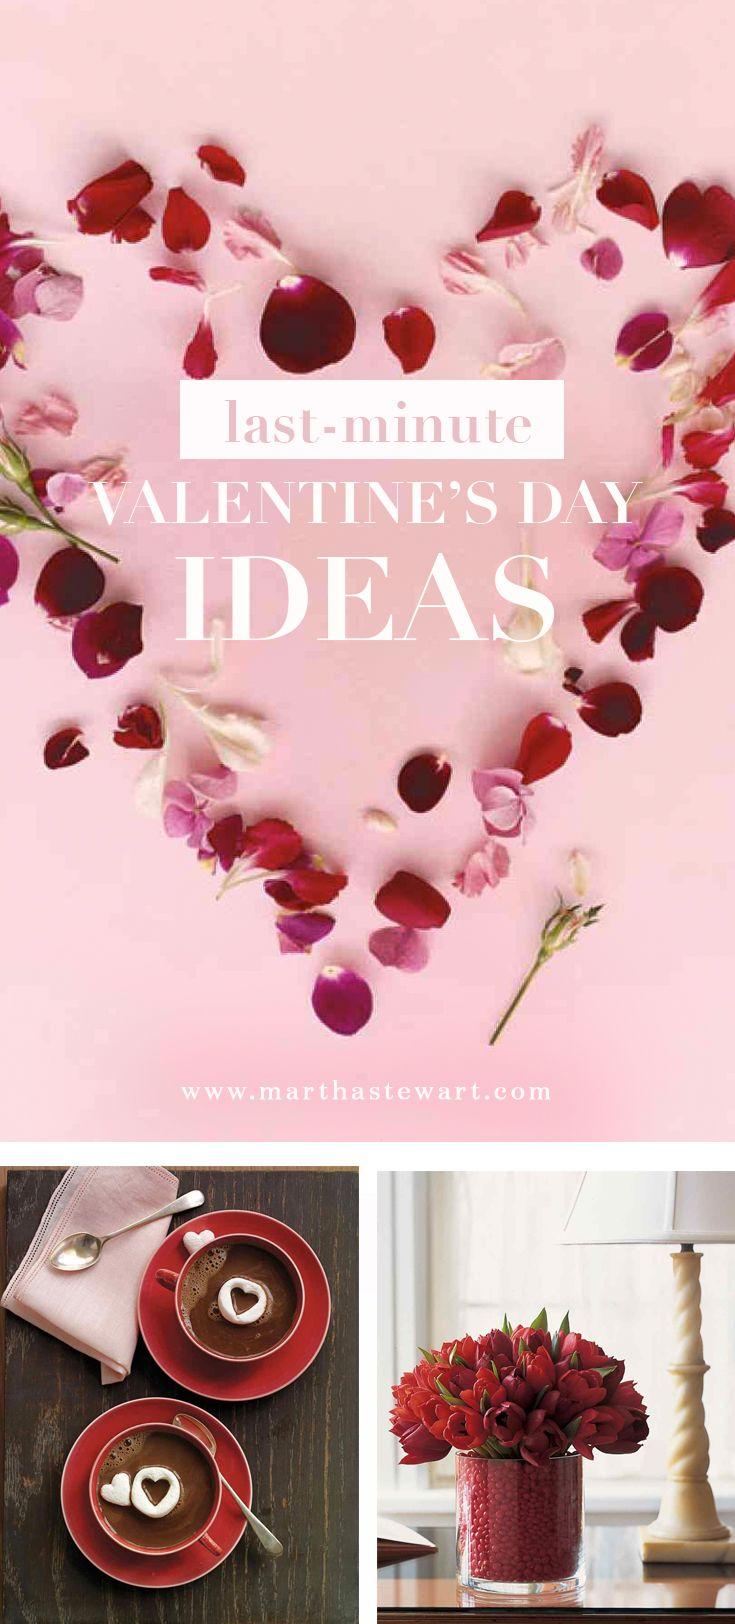 78 best Romantic images on Pinterest | Valentine ideas, Funny ...